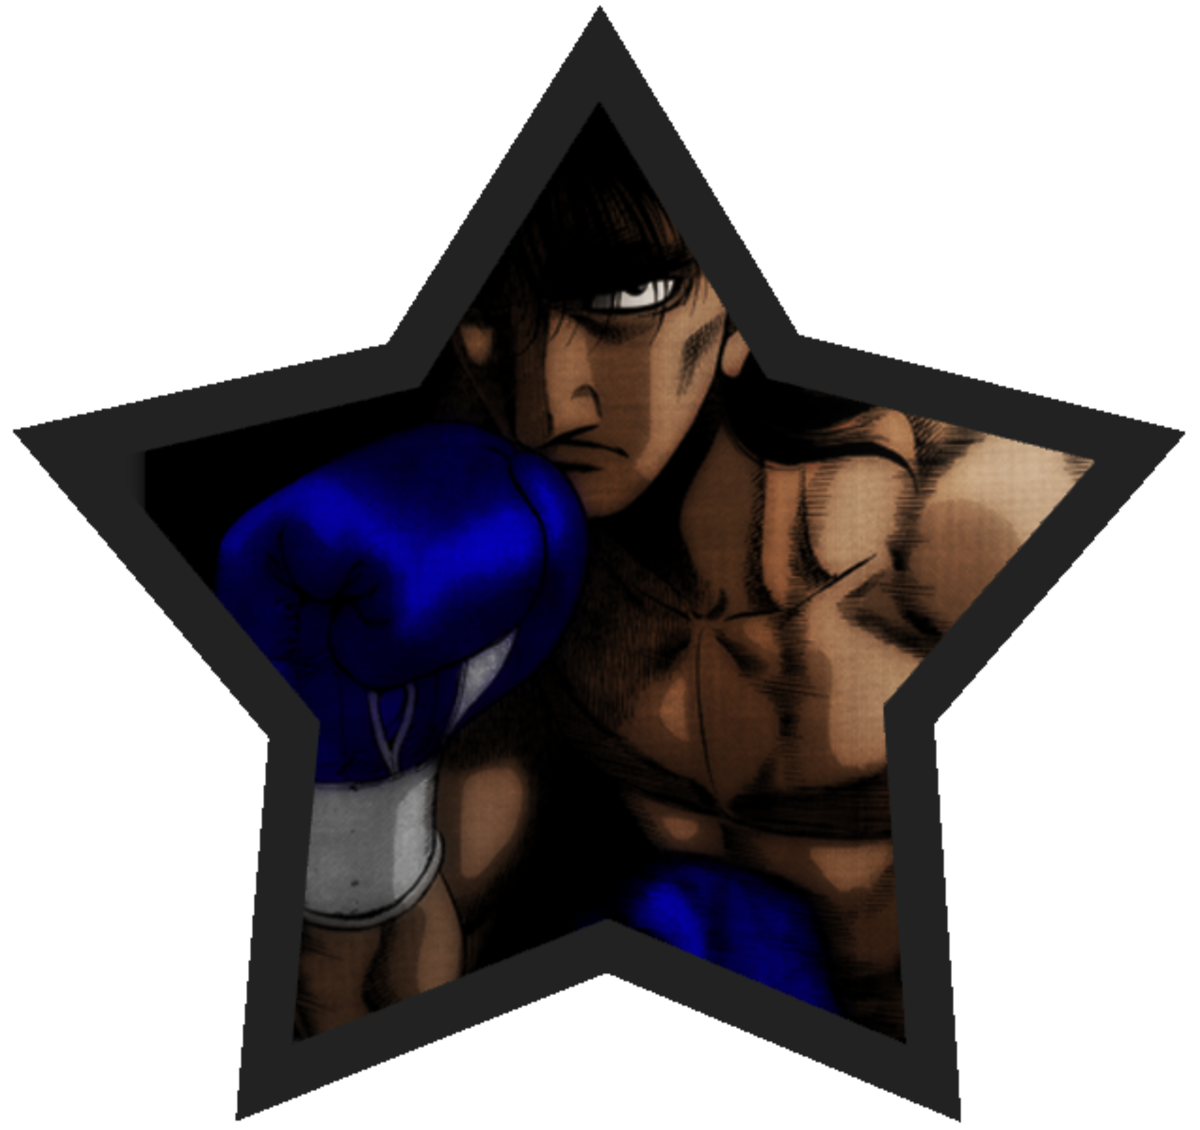 Mashiba's fighting pose.